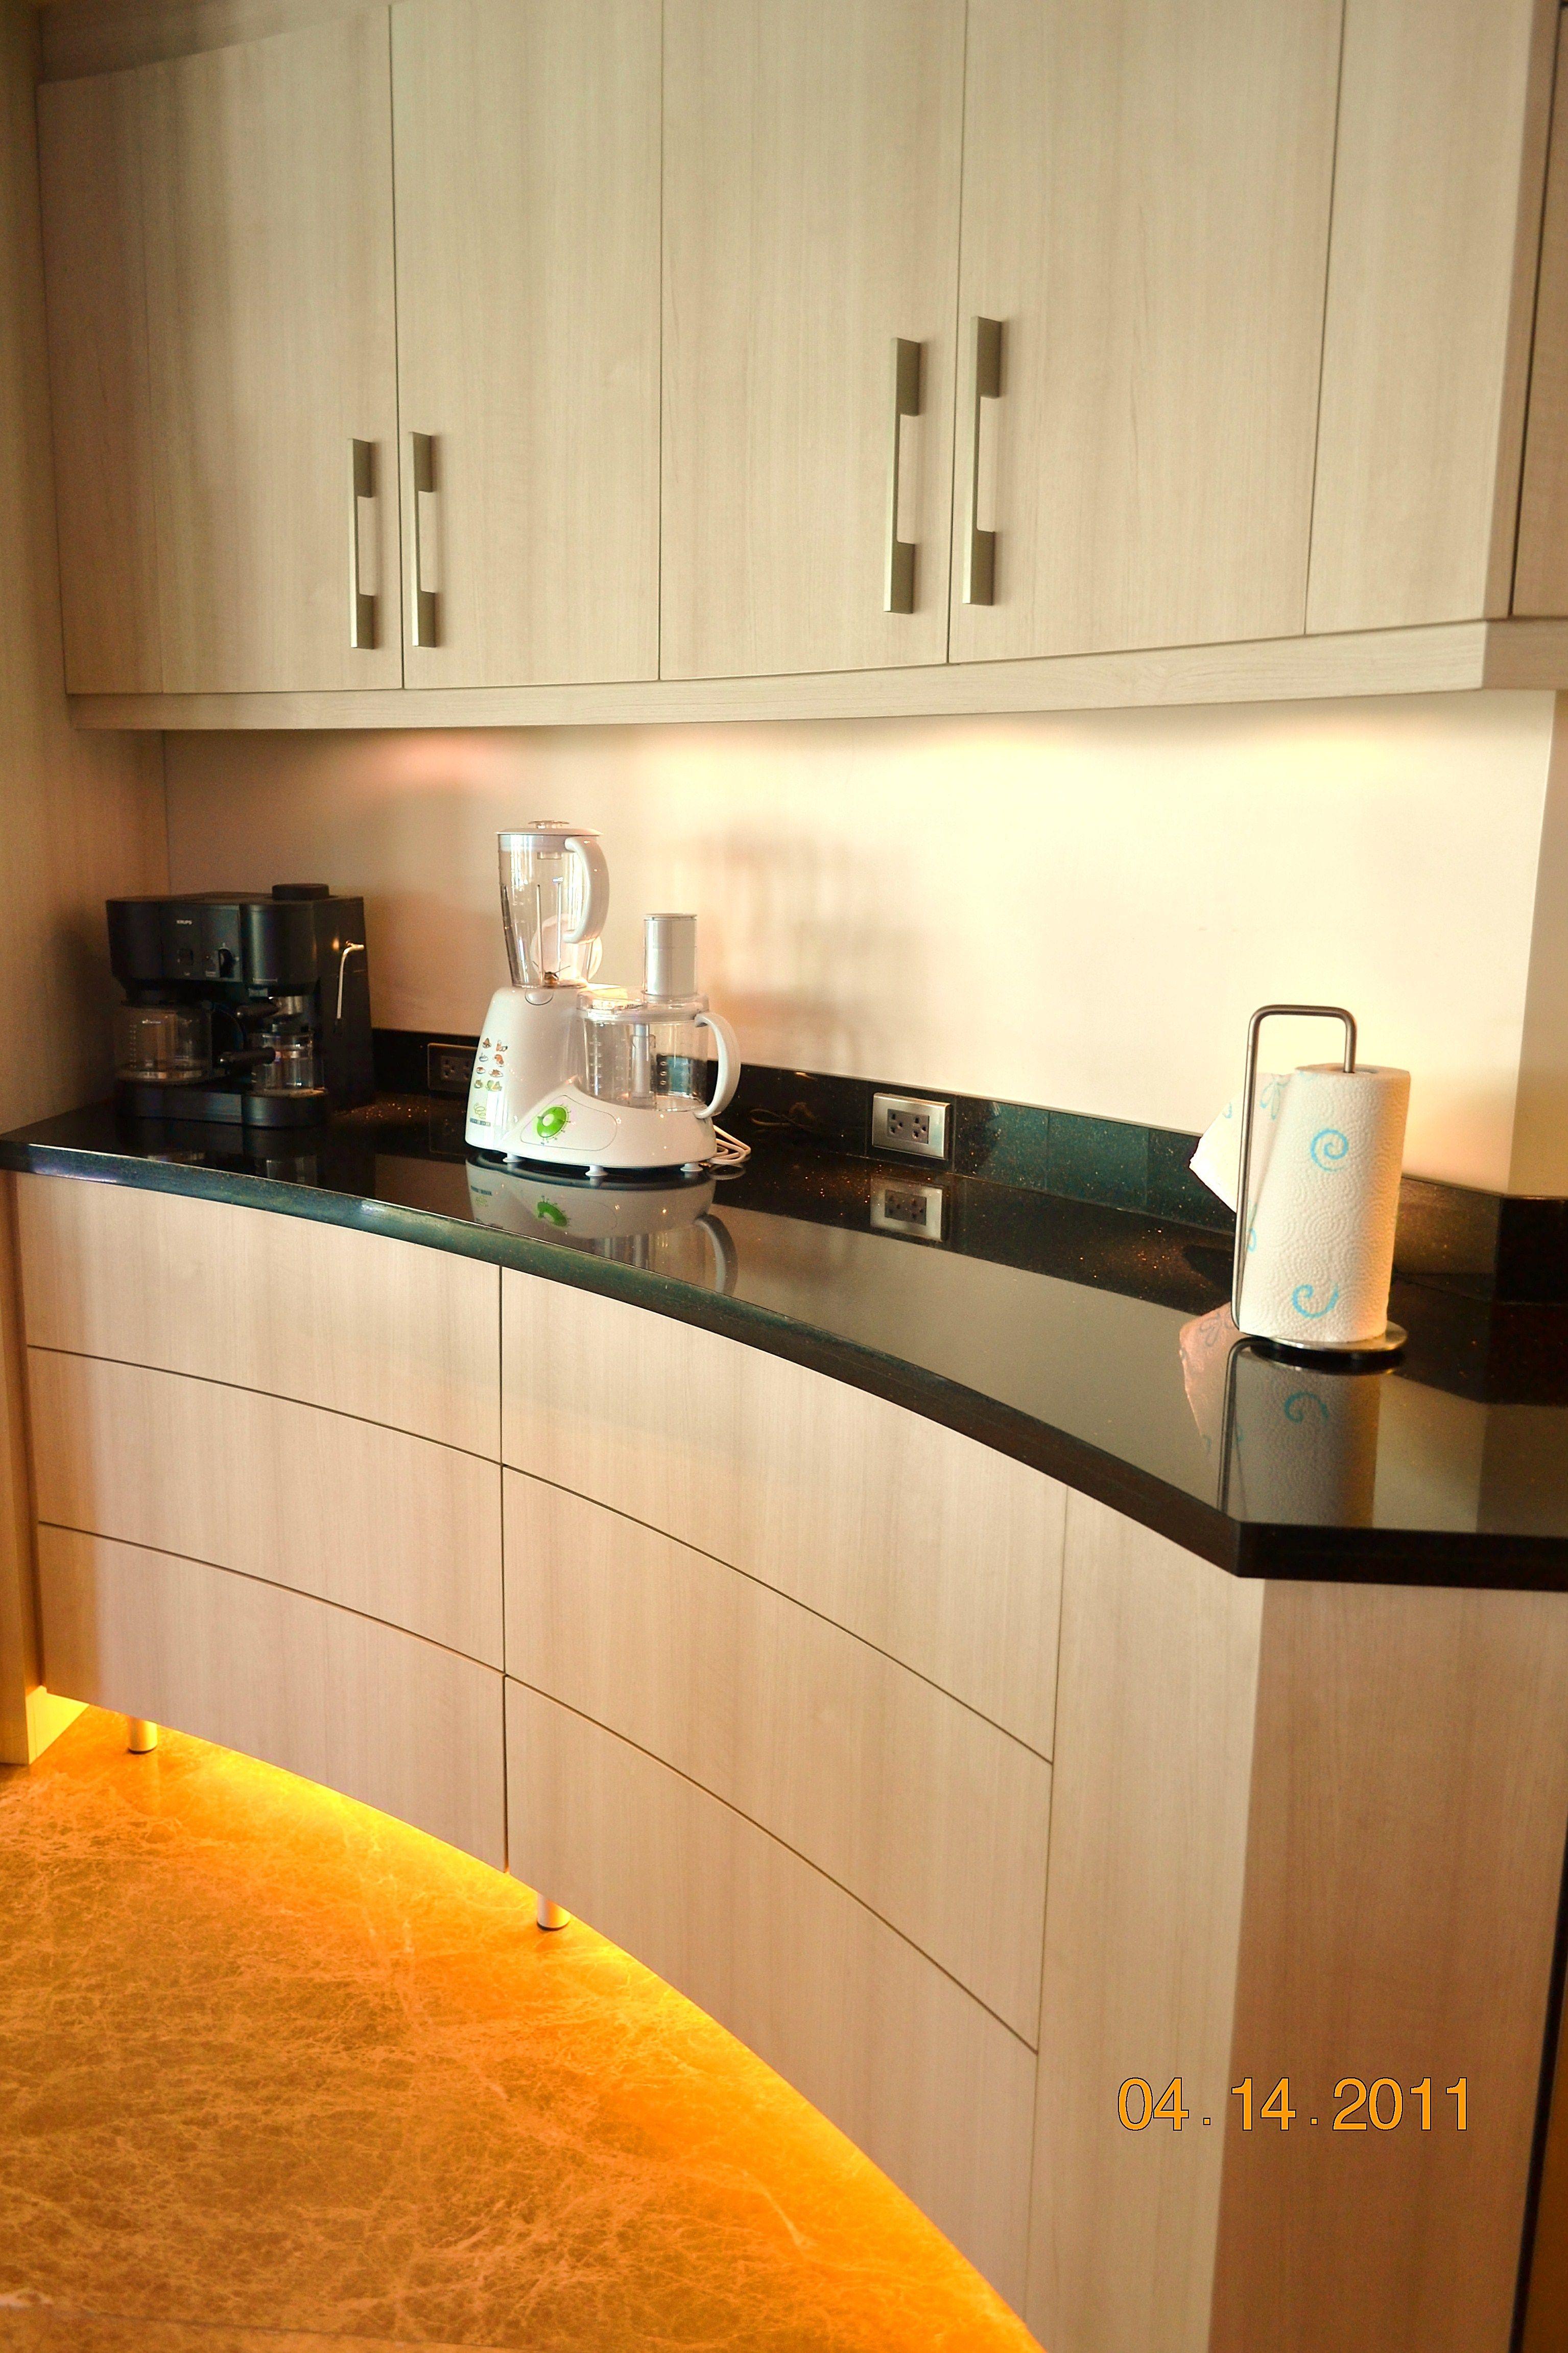 7 Modular Kitchen Cabinets Pampanga Heinen Residence Angeles City Ideas Modular Kitchen Cabinets Pampanga Kitchen Cabinets